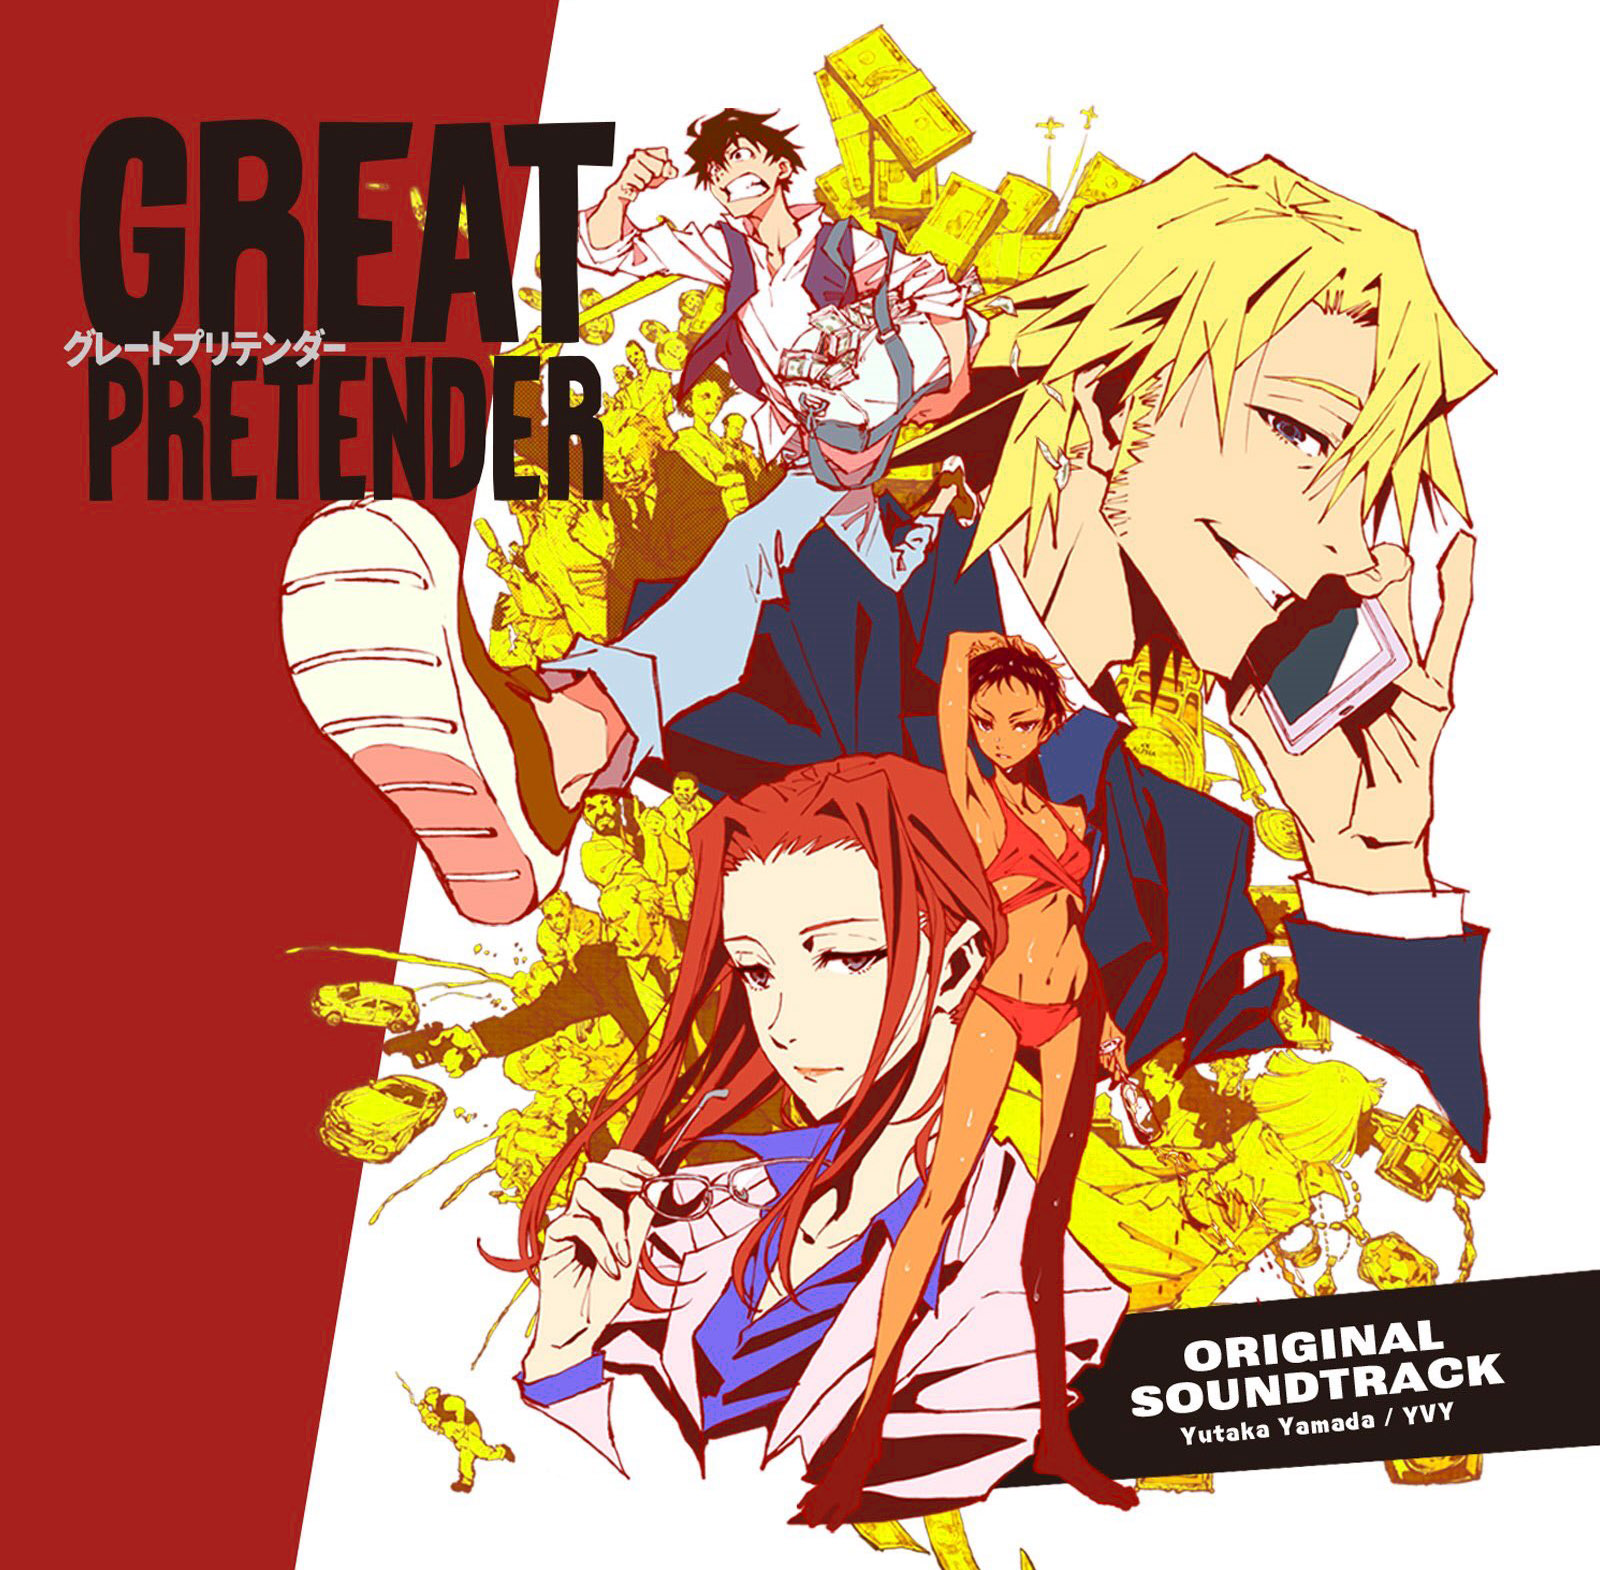 GREAT PRETENDER OST [2020.09.23+MP3+RAR]